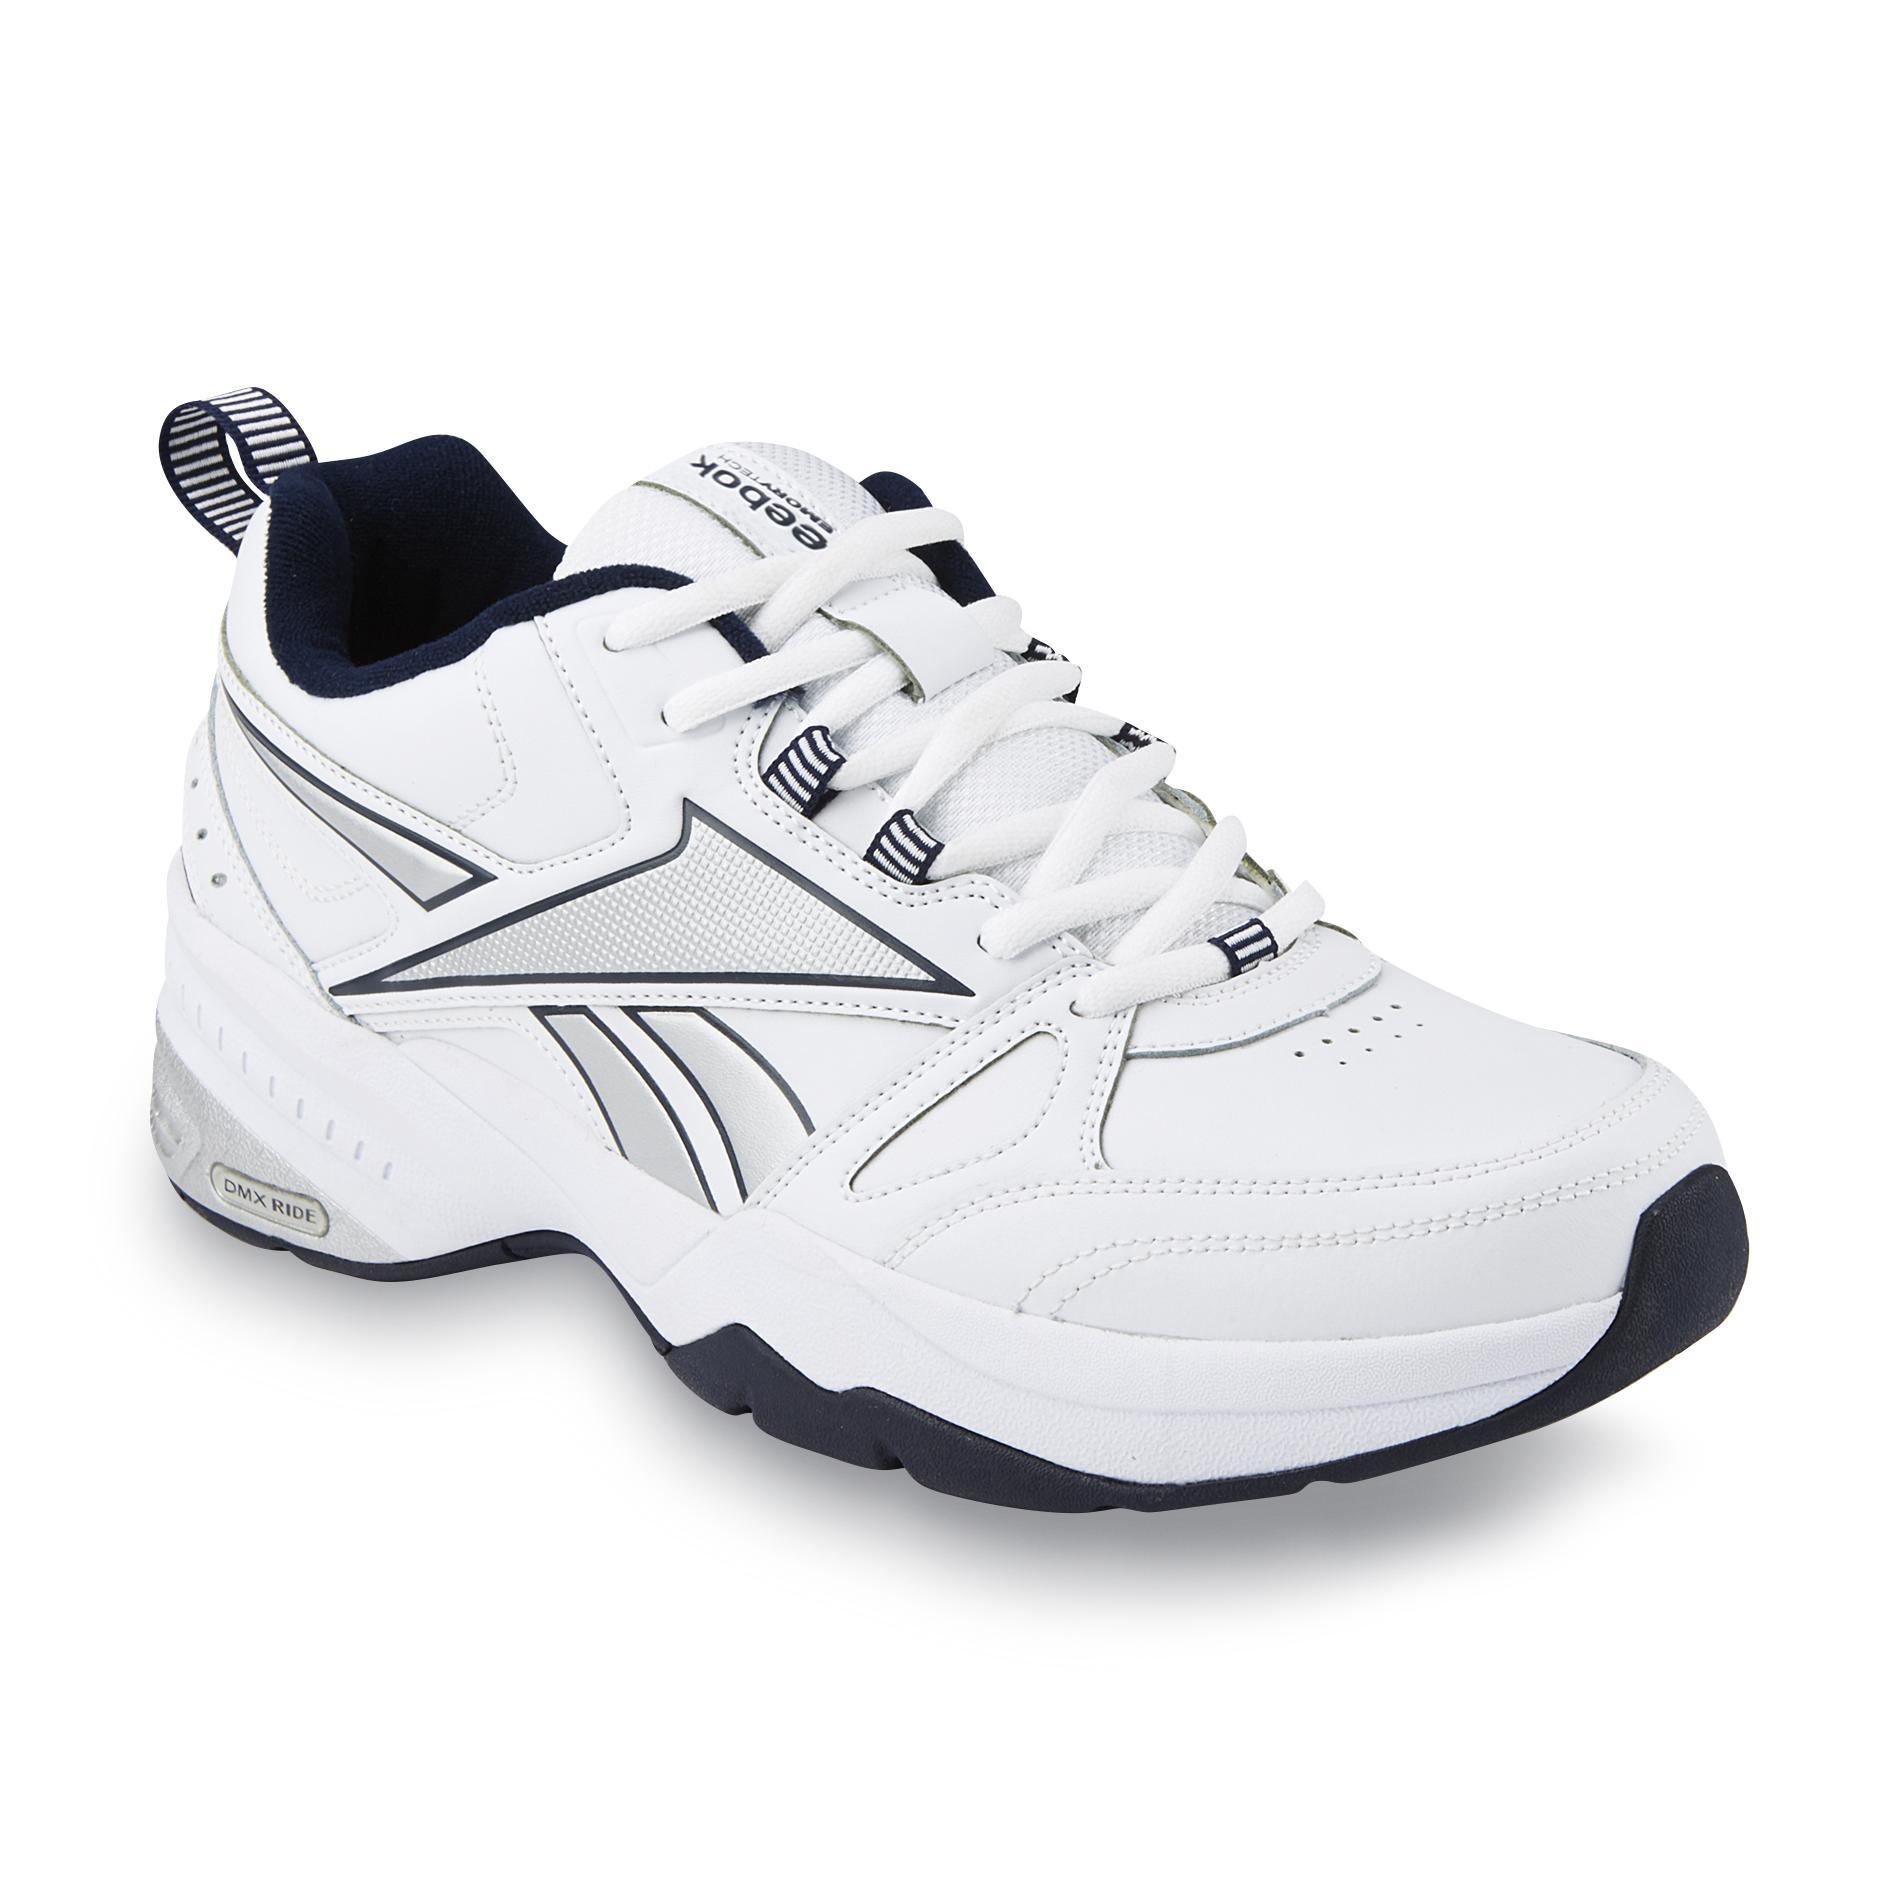 Reebok Men's Royal Trainer White/Gray/Navy Cross-Training Shoe - Extra Wide Width